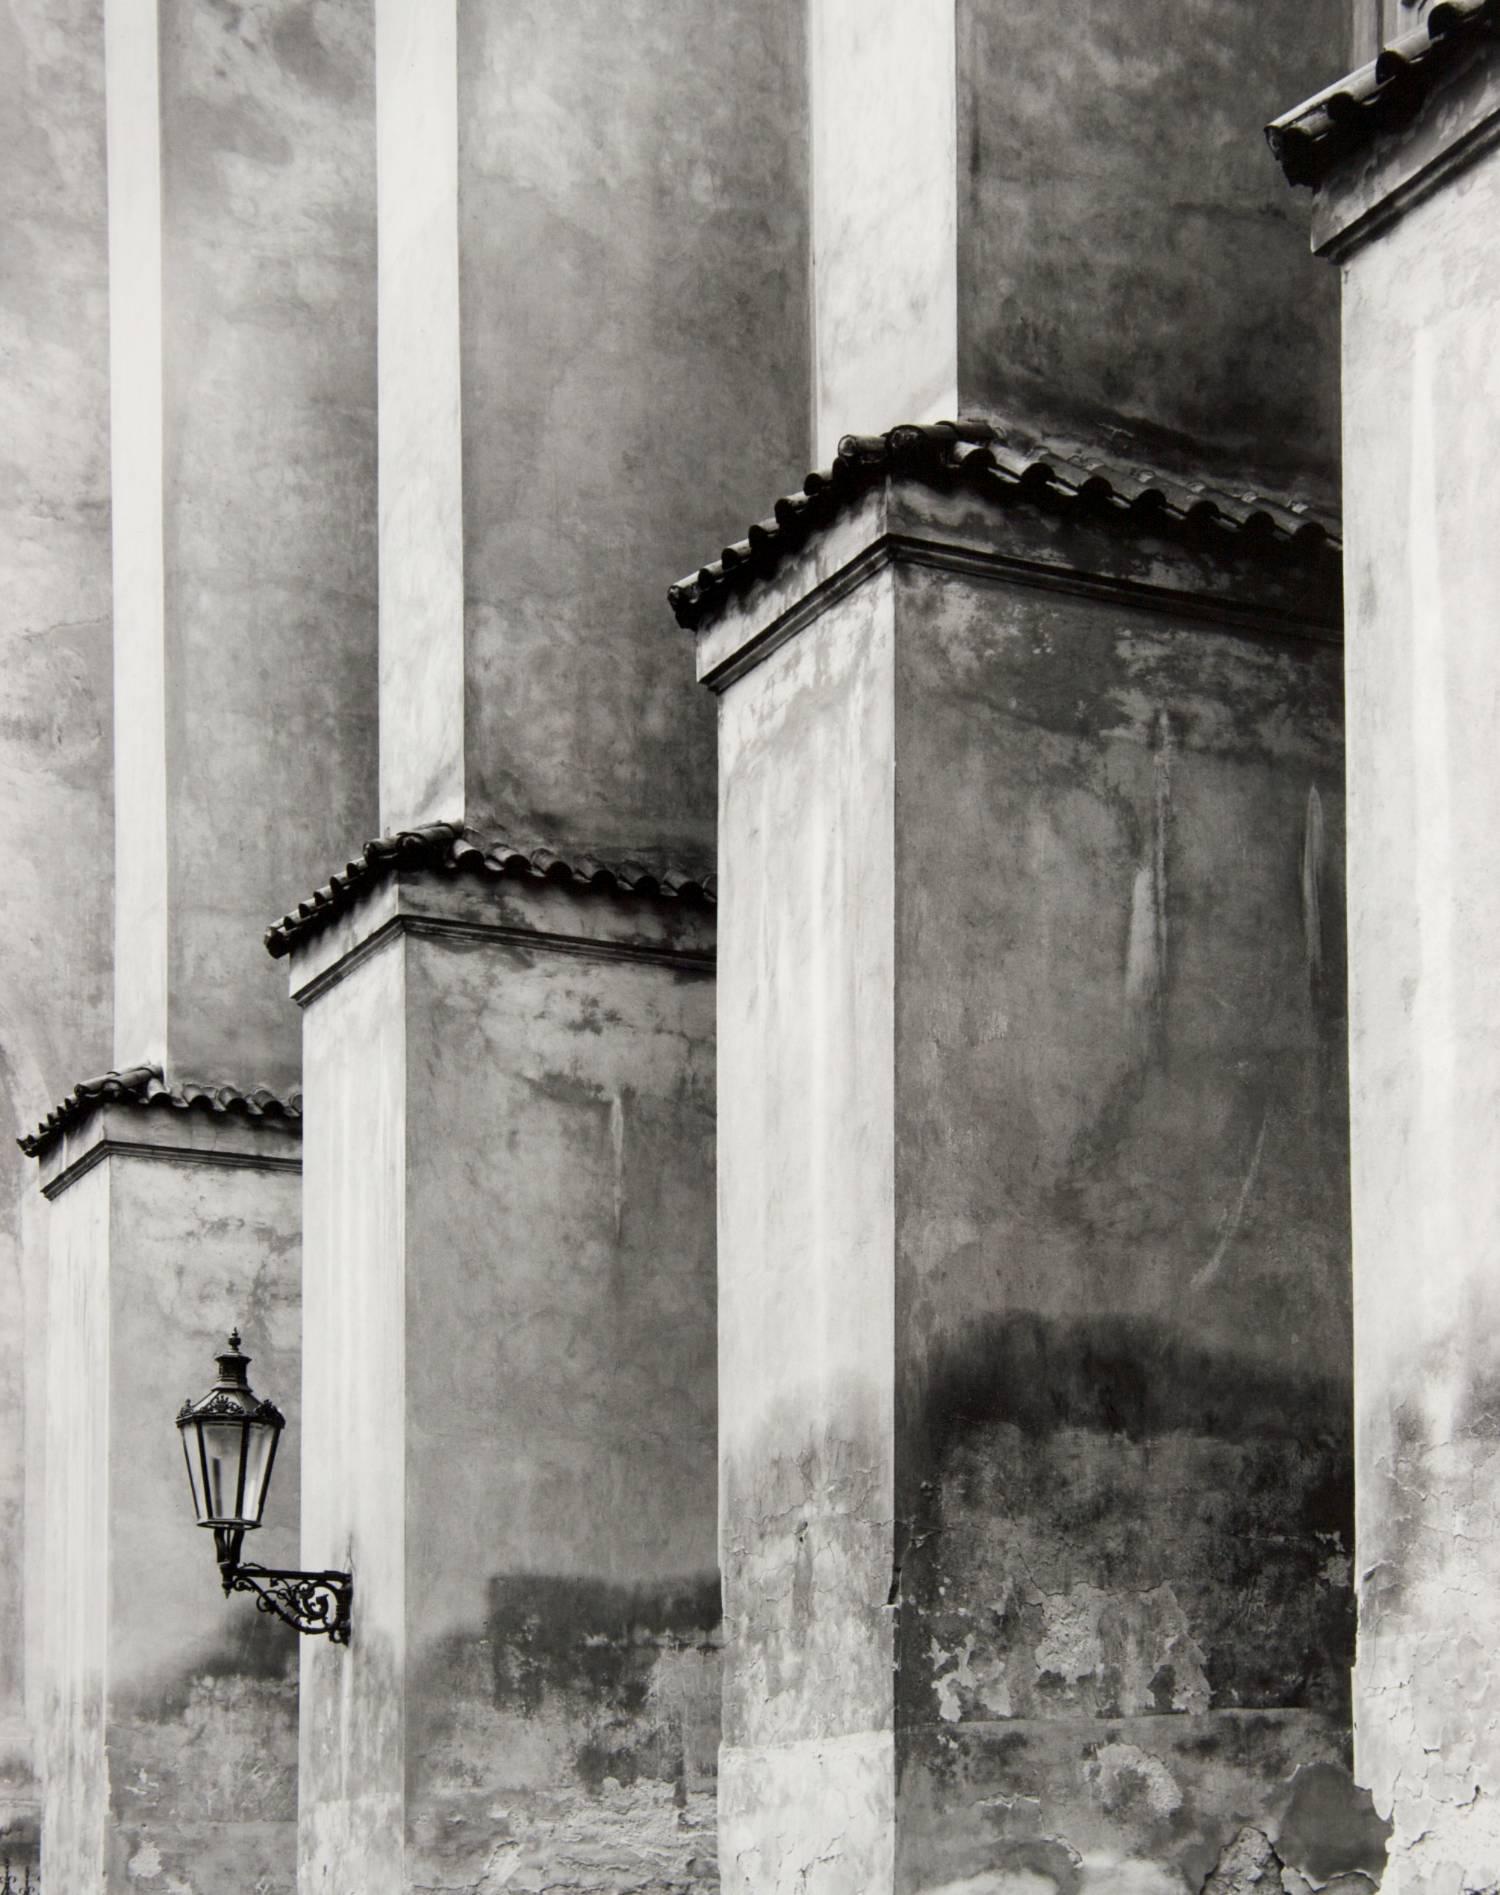 Lantern in Prague (Basilica of St. James, Czech Republic)